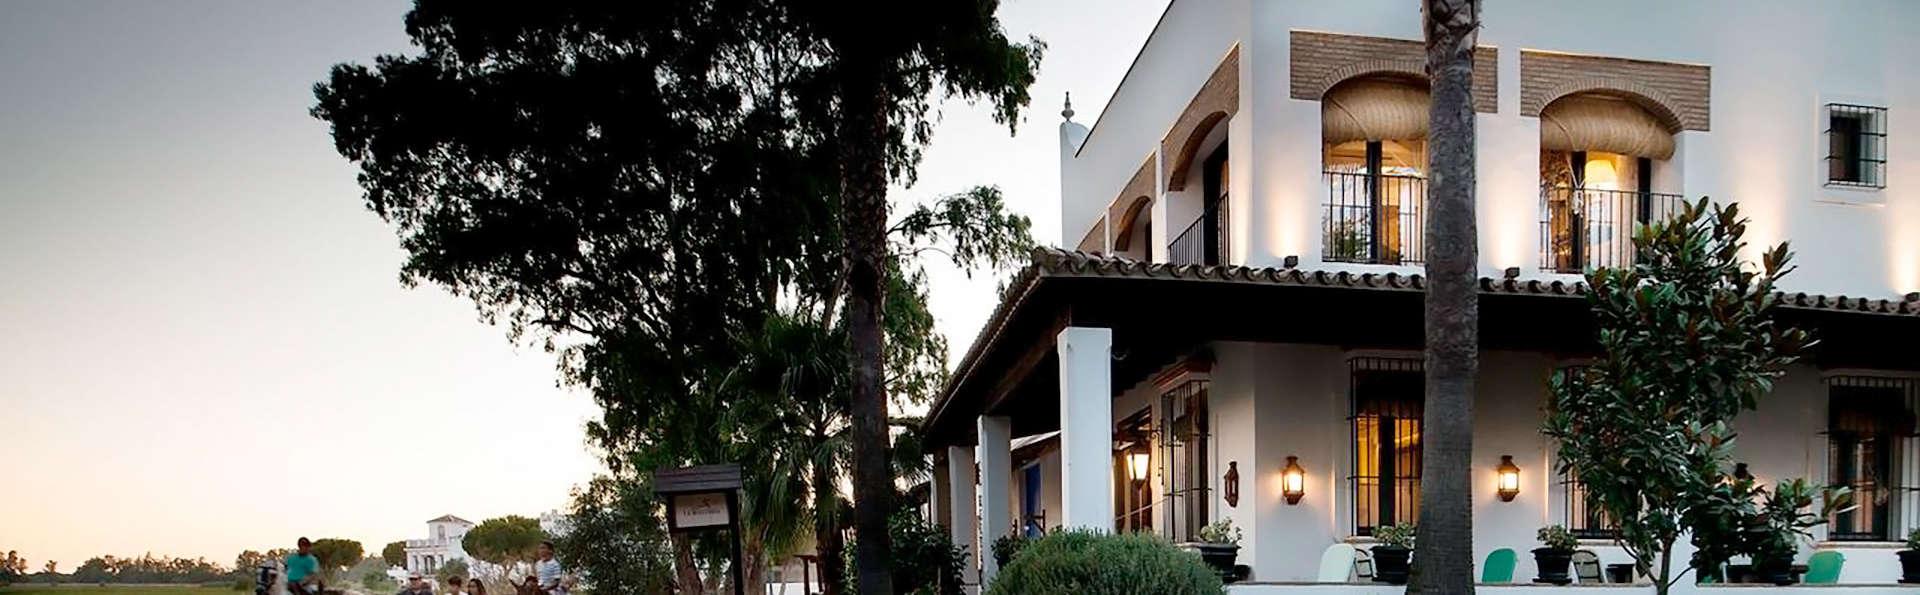 La Malvasia Hotel - EDIT_FRONT_02.jpg